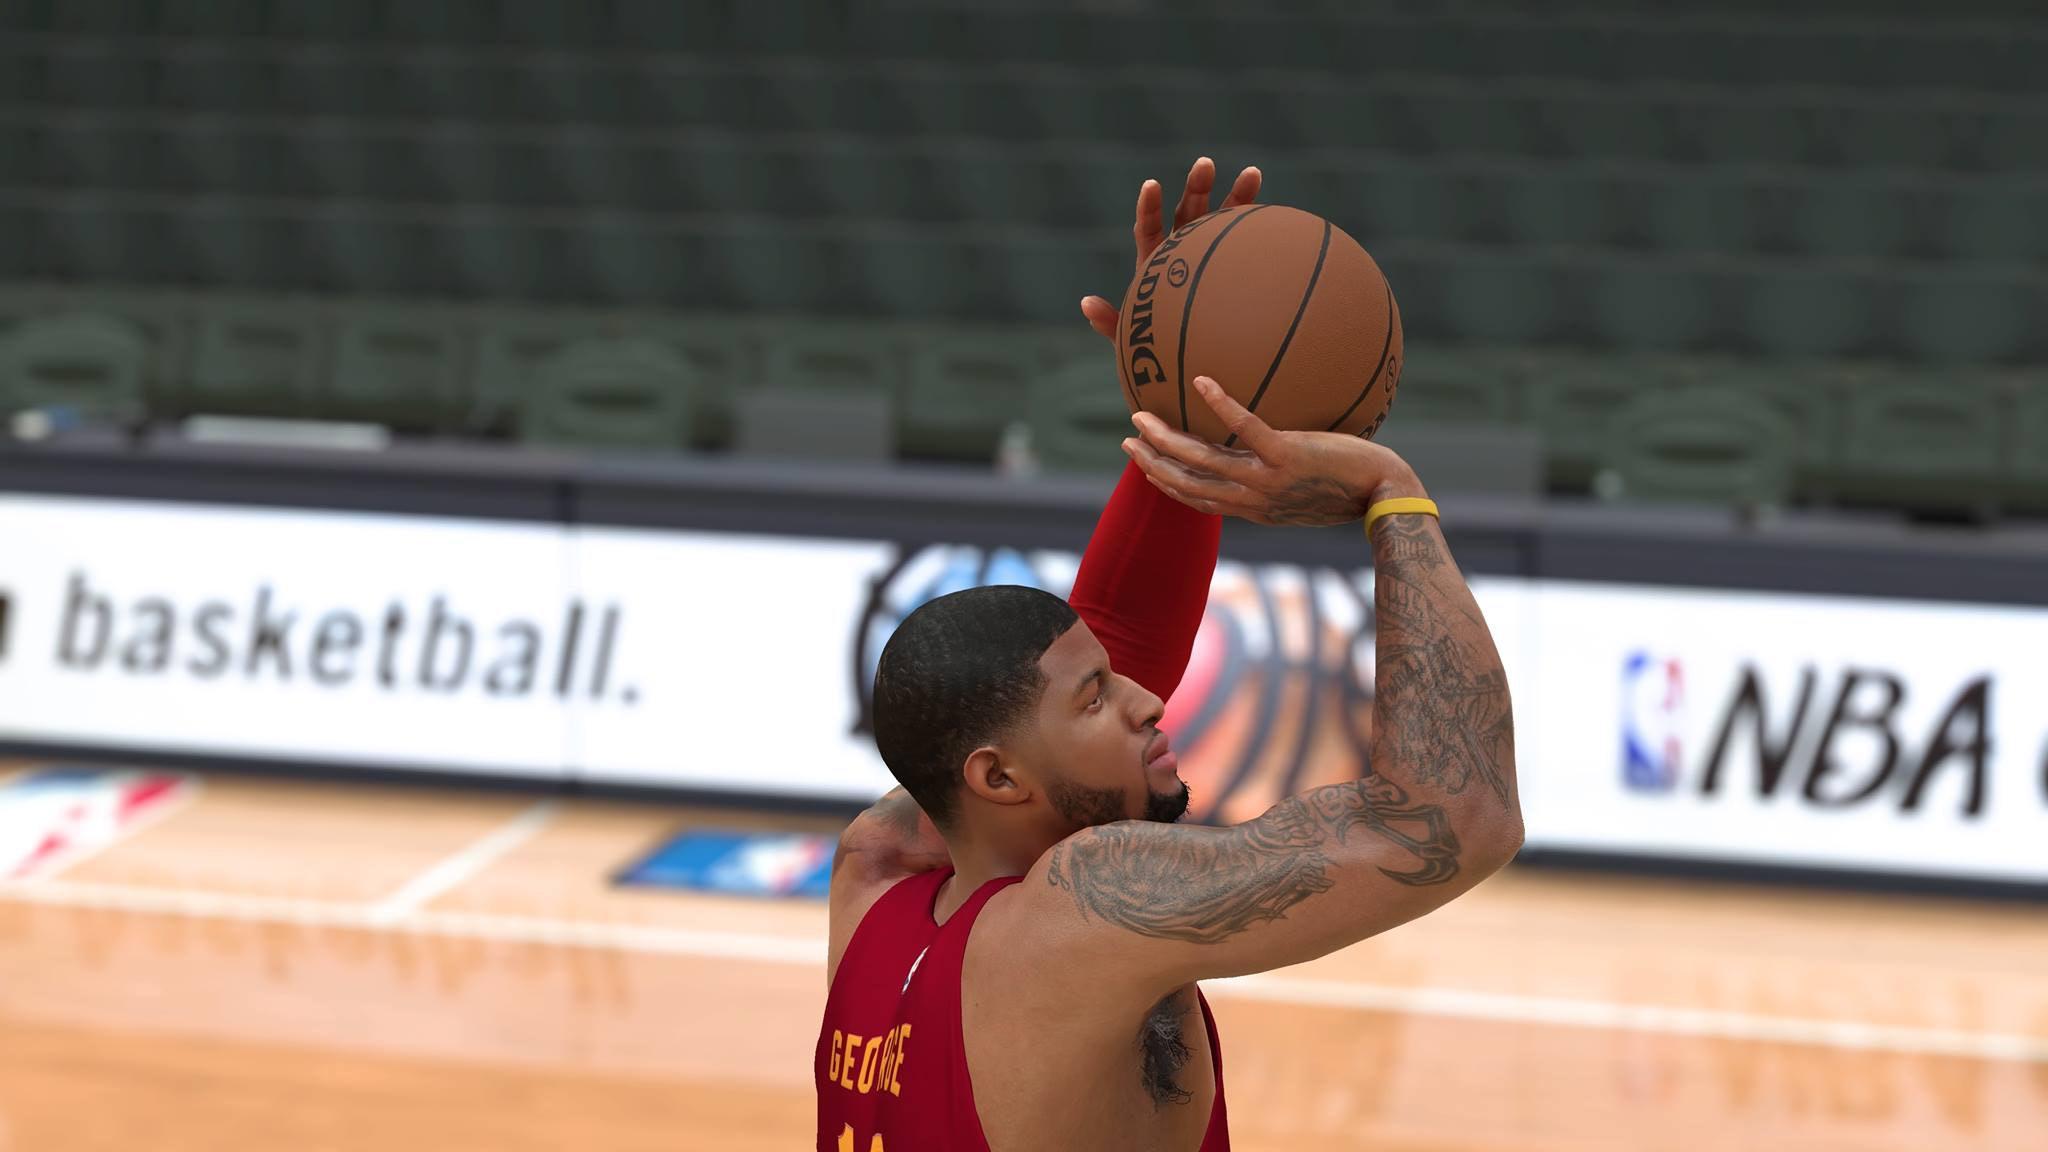 NBA 2K17': Best custom jump shot for your MyPlayer